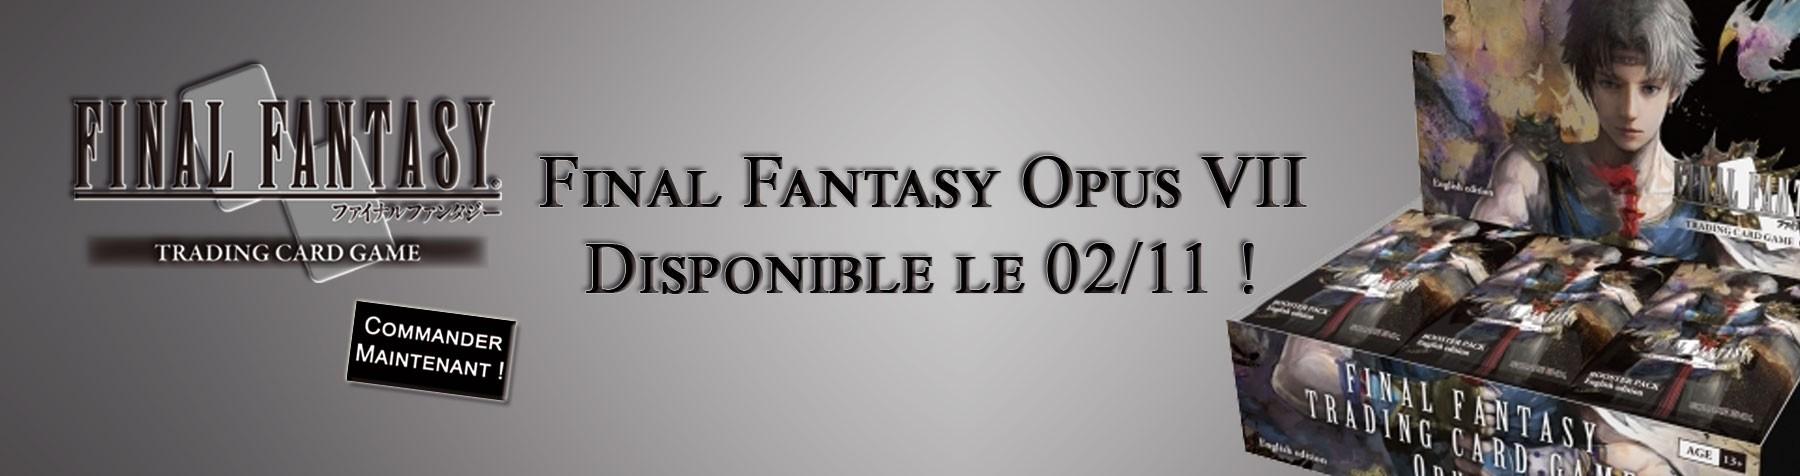 Final Fantasy Opus 7